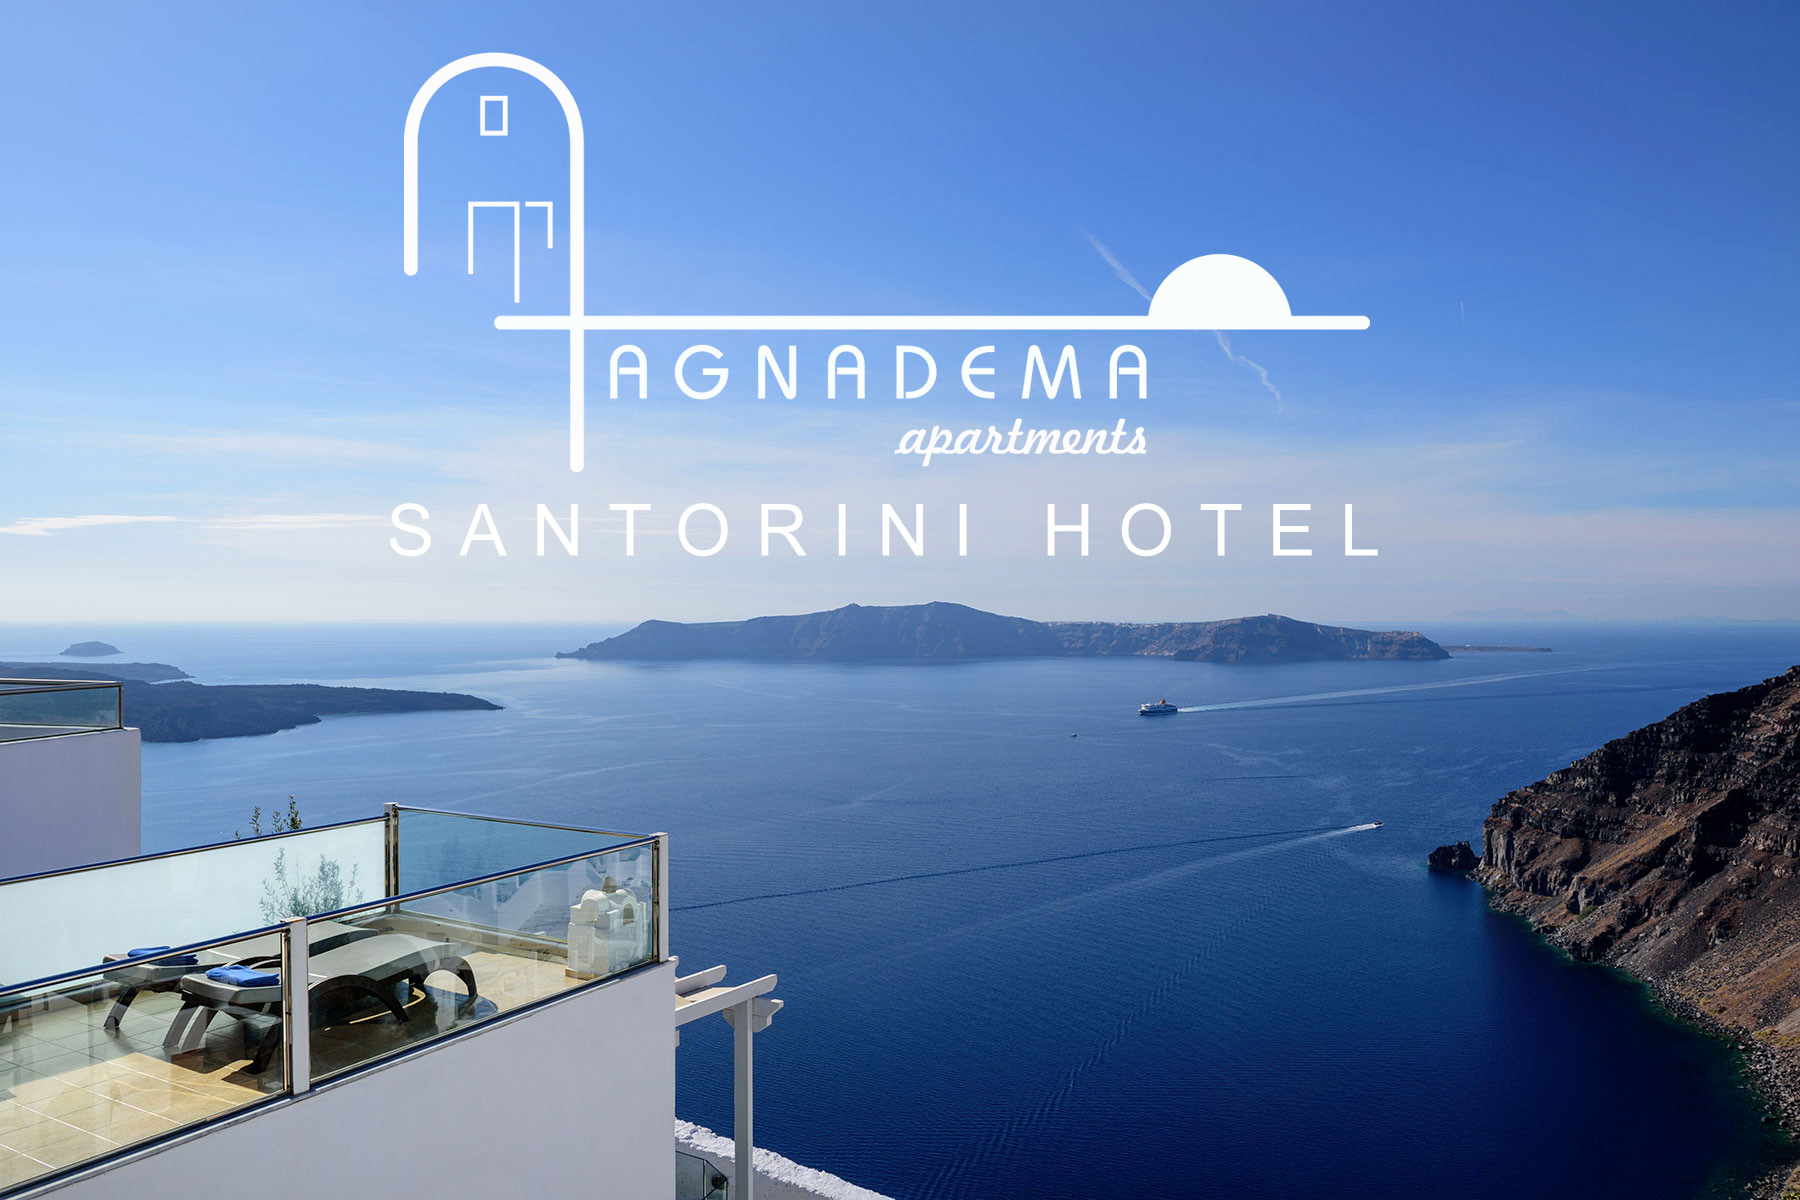 Agnadema Santorini Apartments Hotel Firostefani Located In A Magnificent Spot Right The Heart Of Caldera